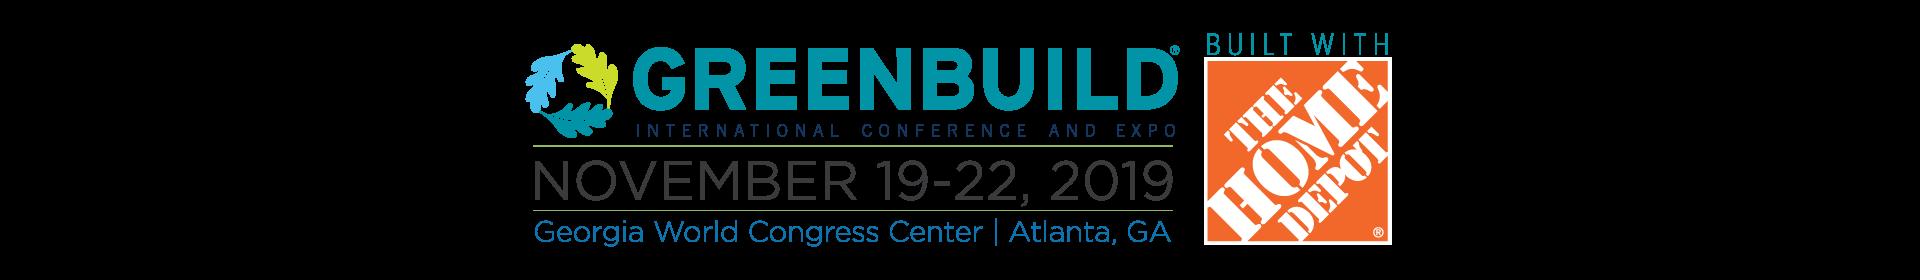 Greenbuild 2019 Event Banner